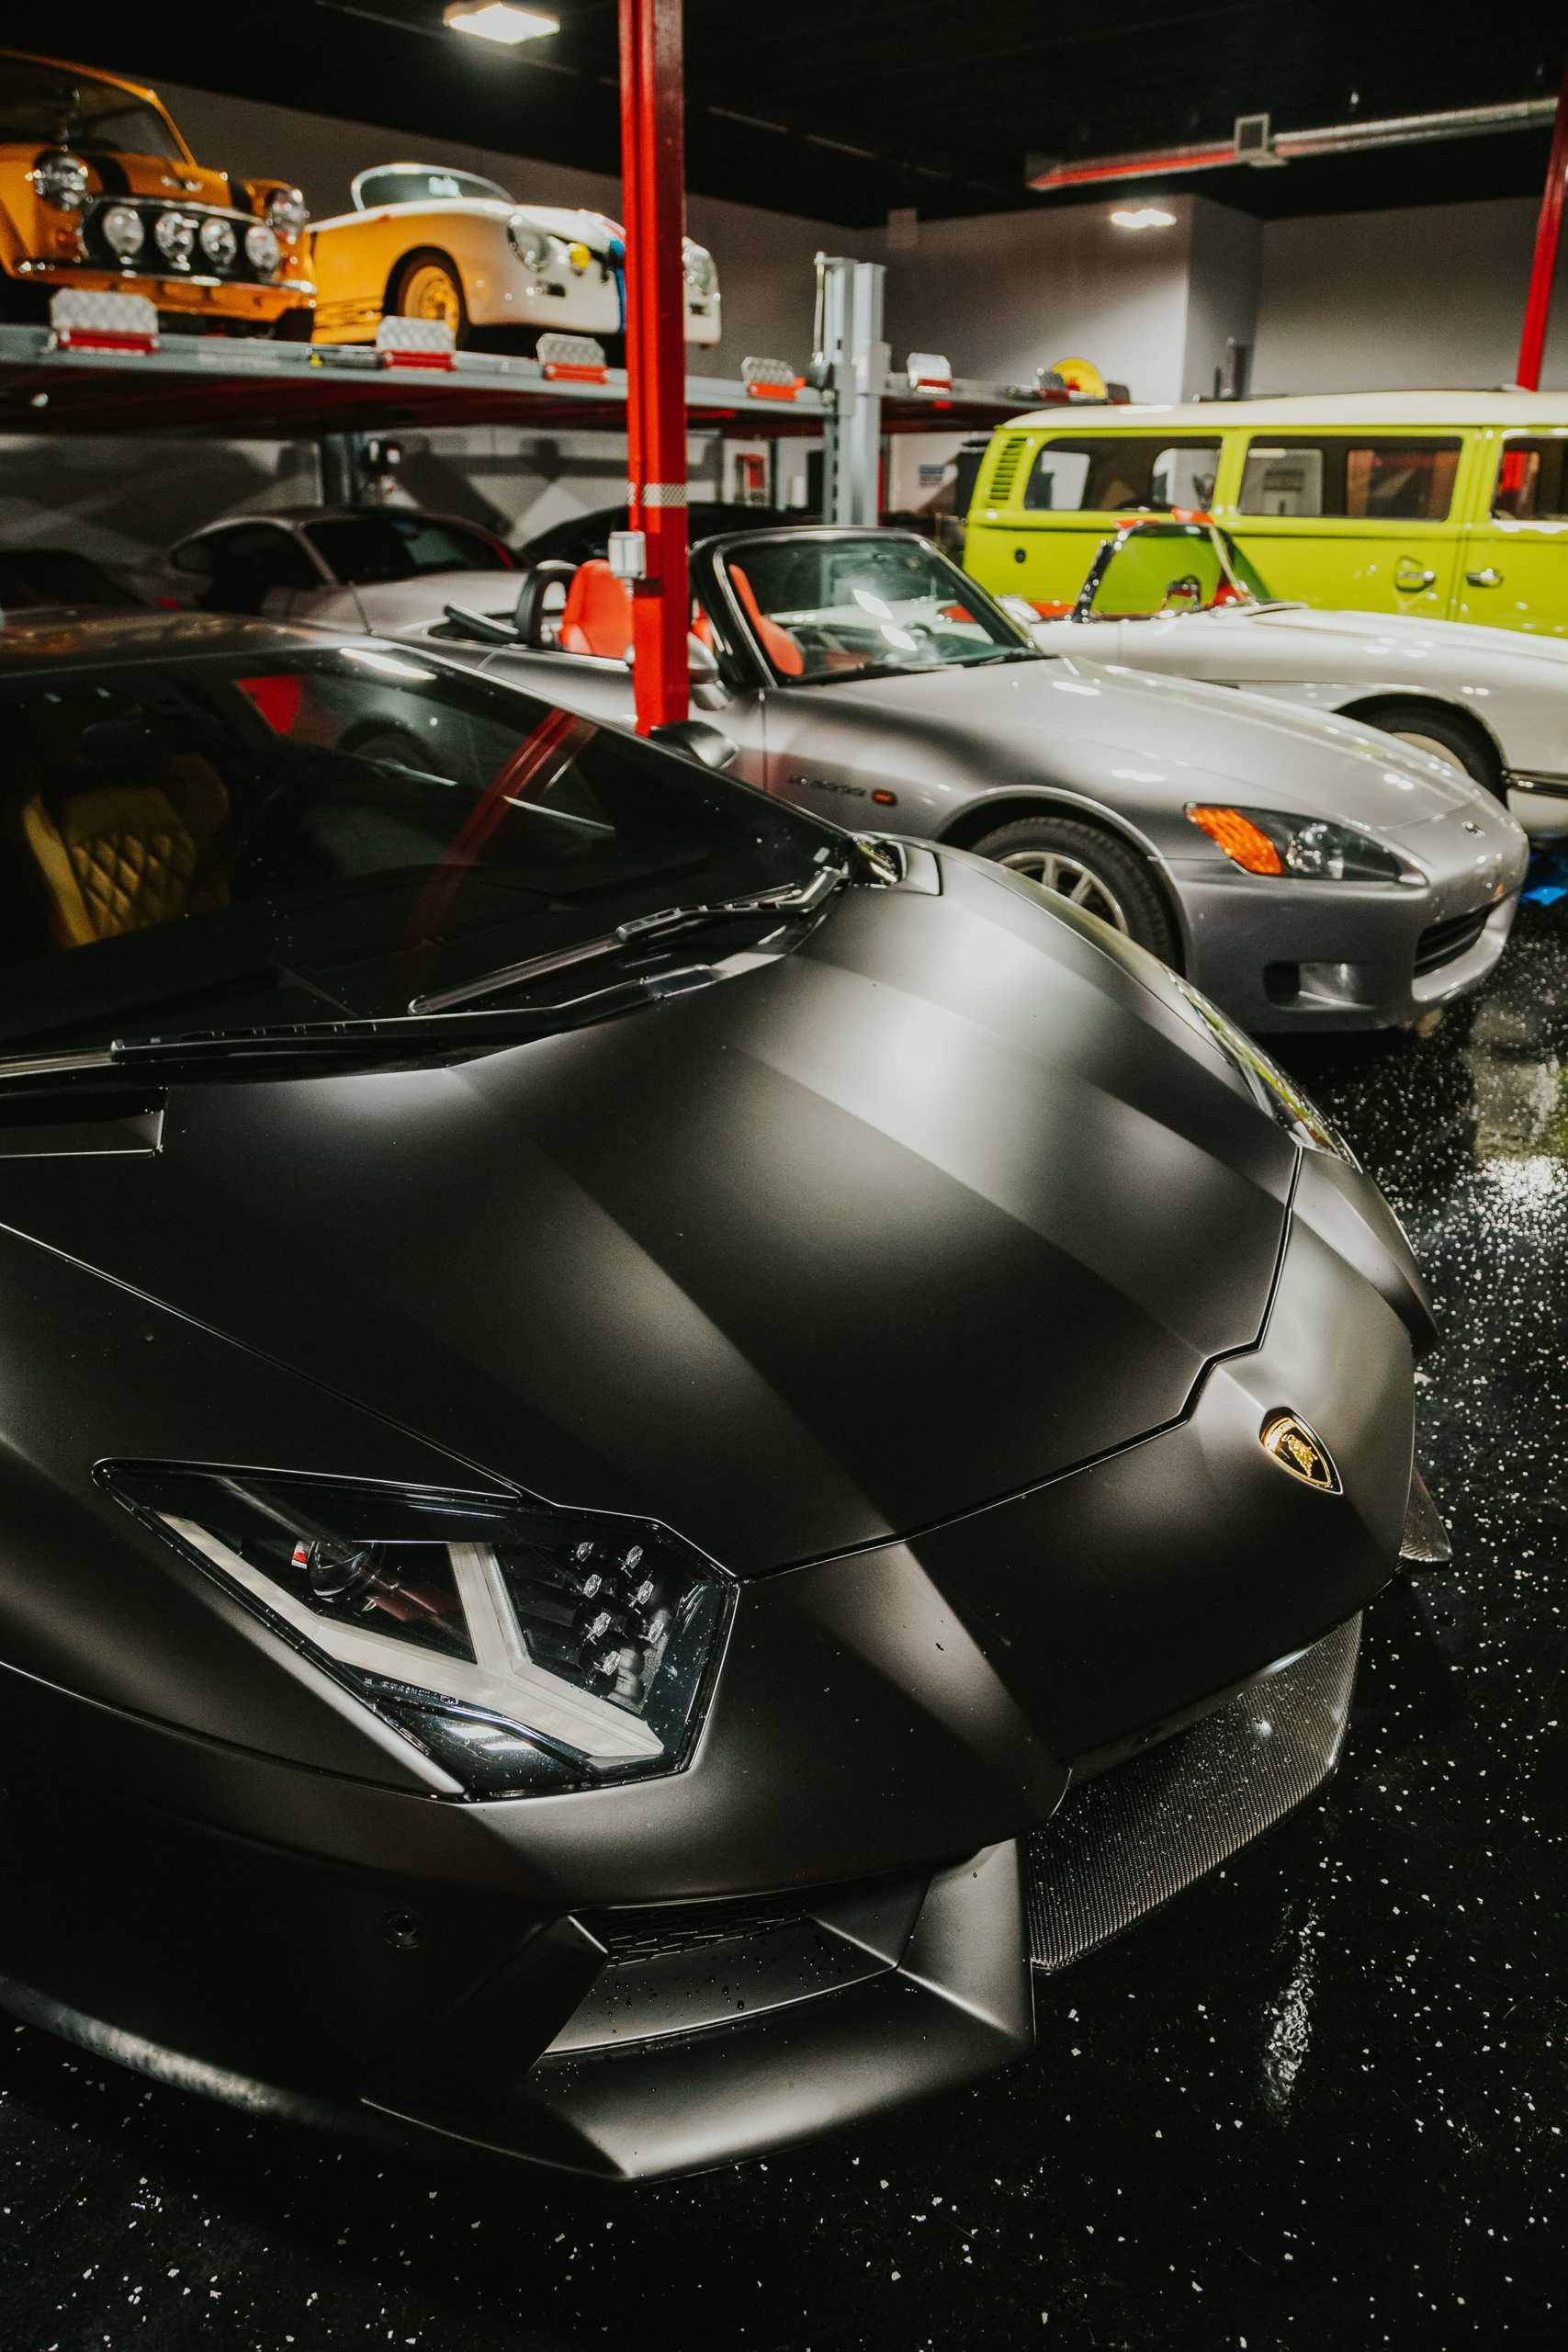 Rent Lamborghini in Miami Beach - Pugachev Luxury Car Rental